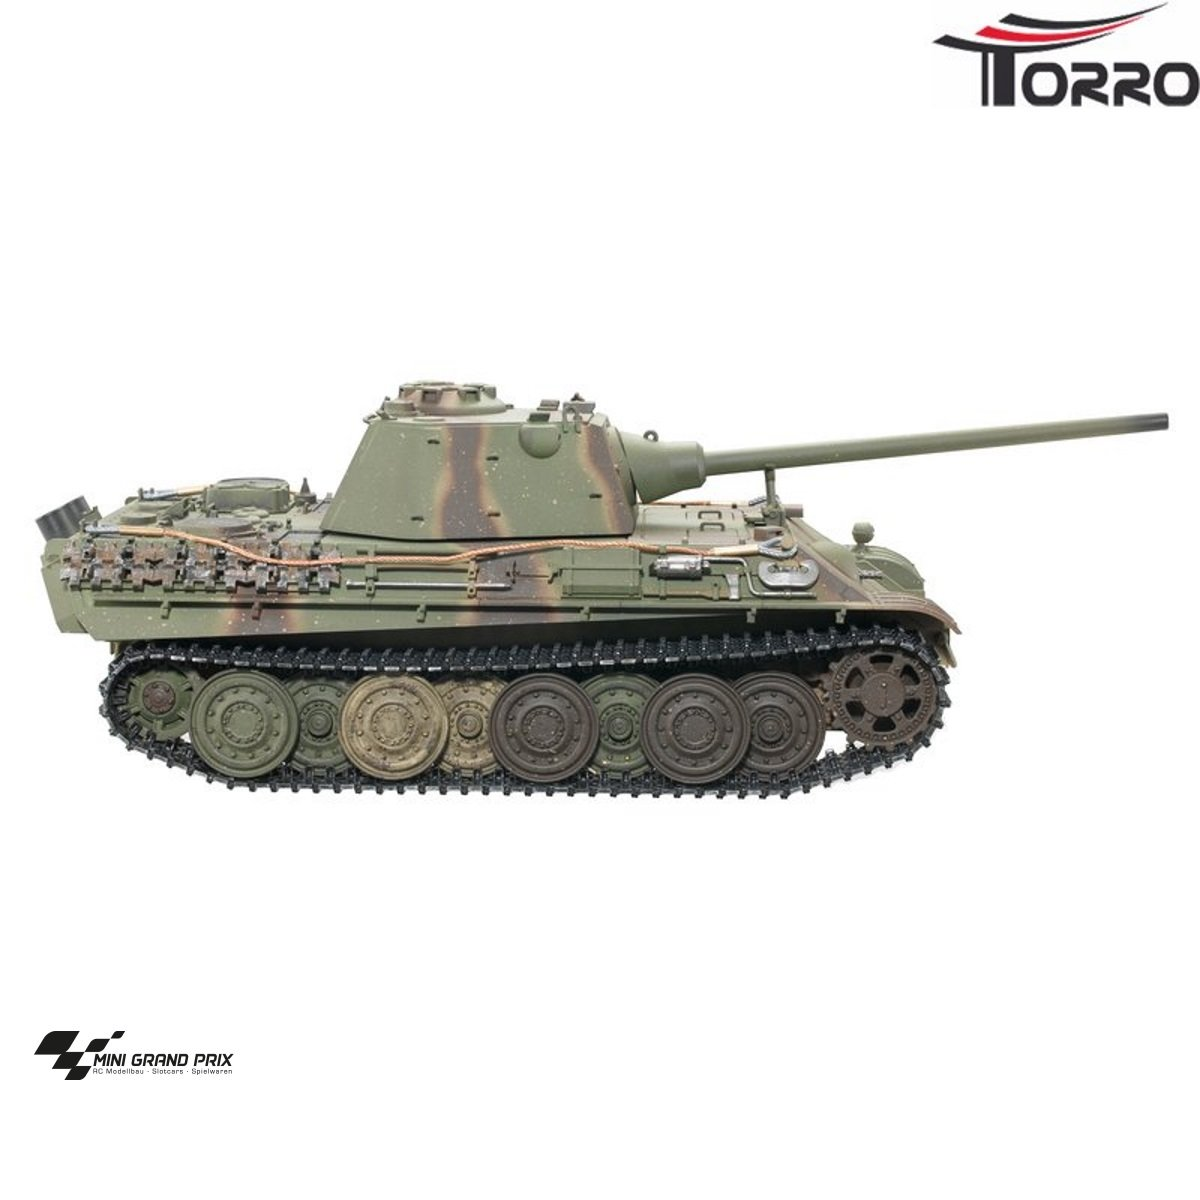 Torro 1:16 RC Panther F Profi Metallausführung IR Grün/TarnTORRO Panzer mit Holzkiste 1213879503